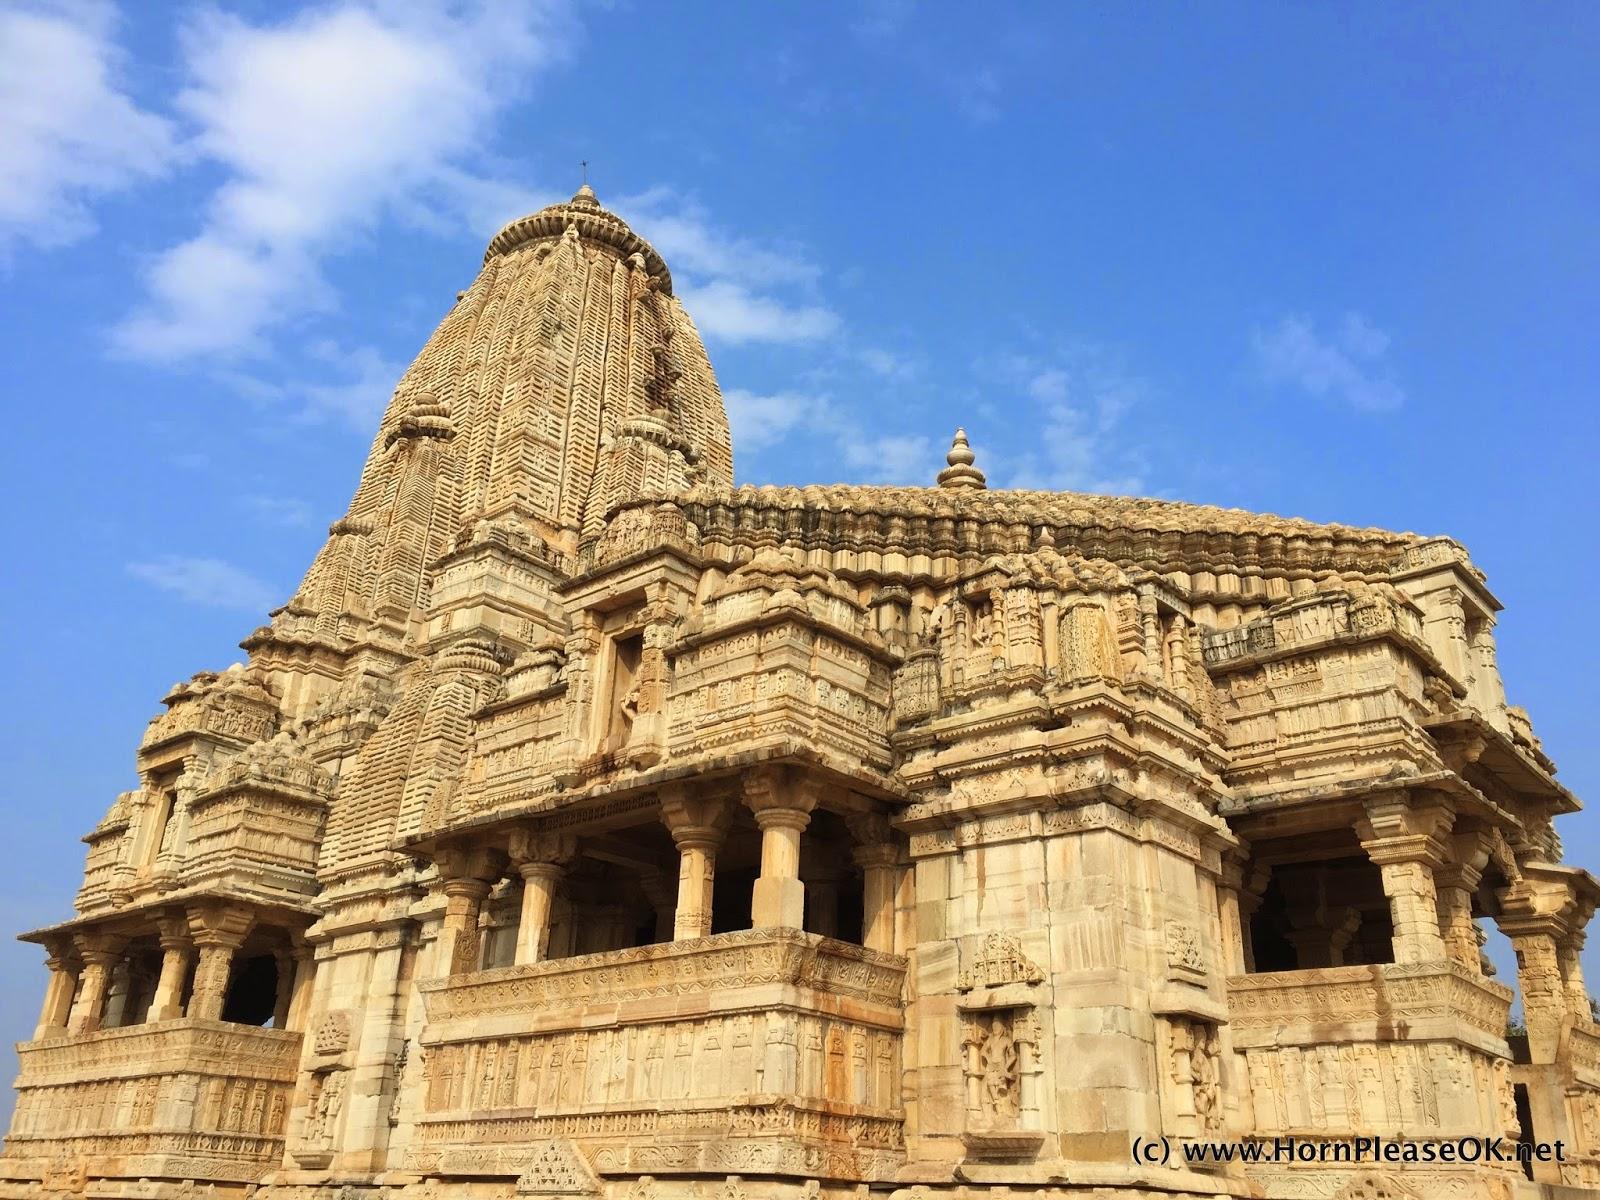 Kalika Mata temple side view